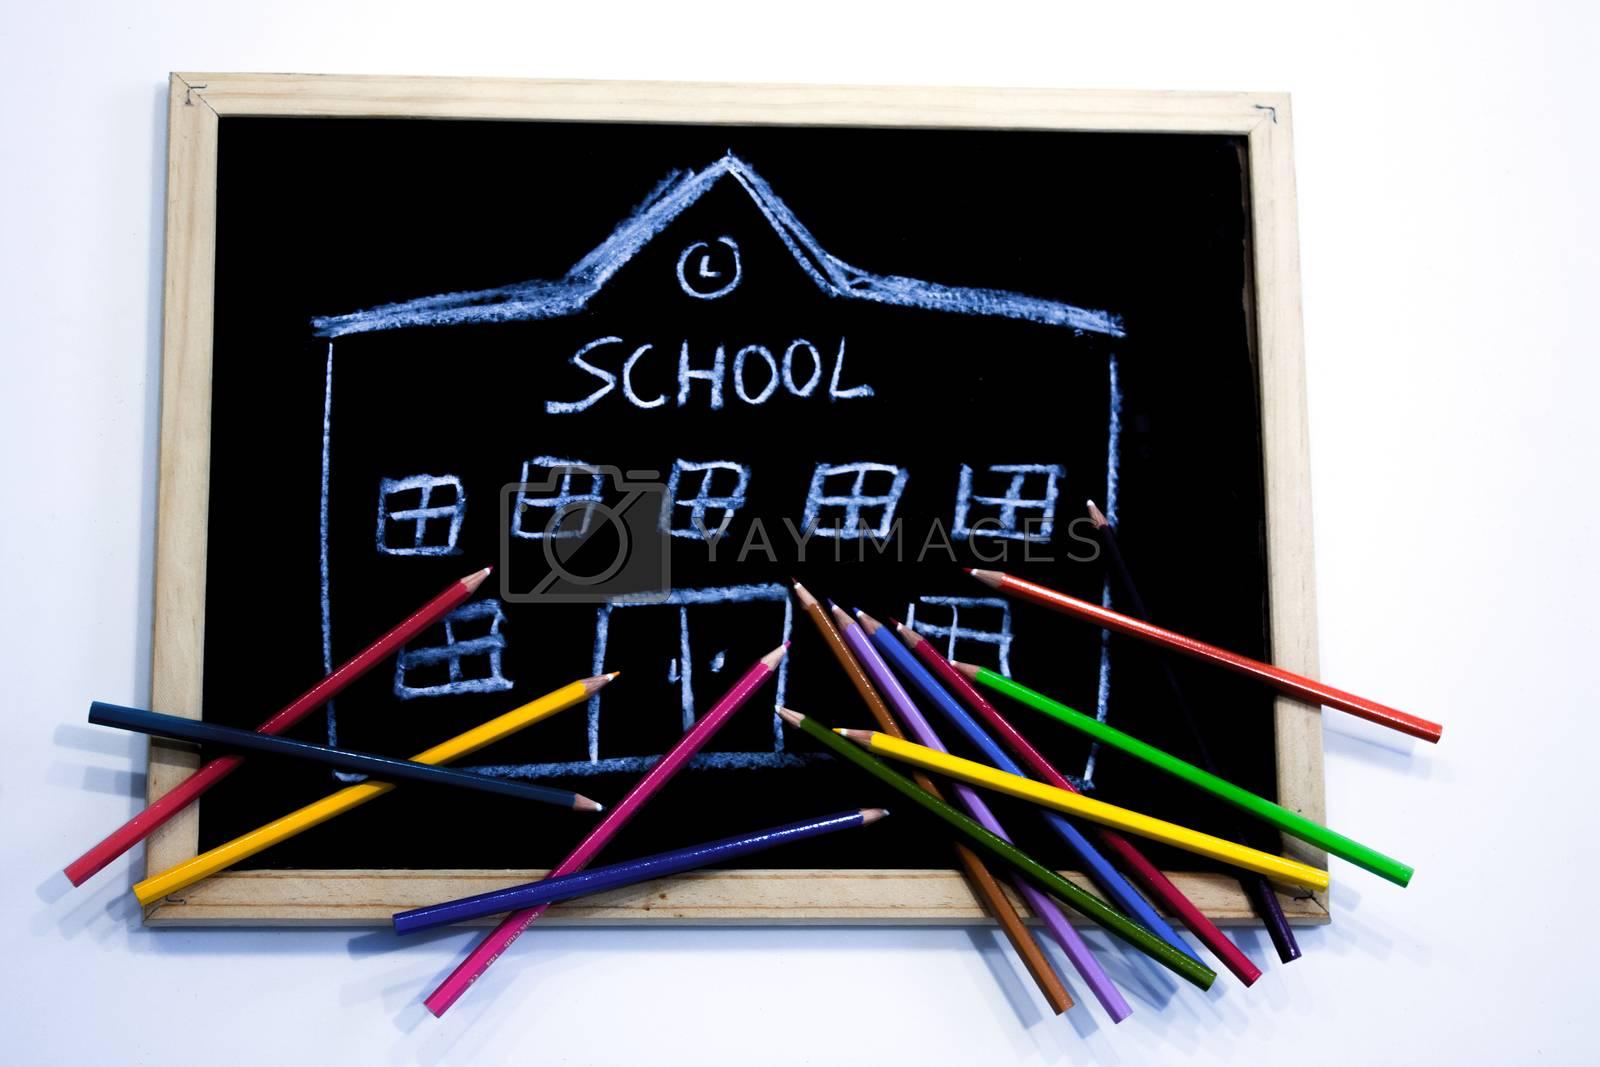 a few colored pencils arranged on a chalkboard where a school building is drawn